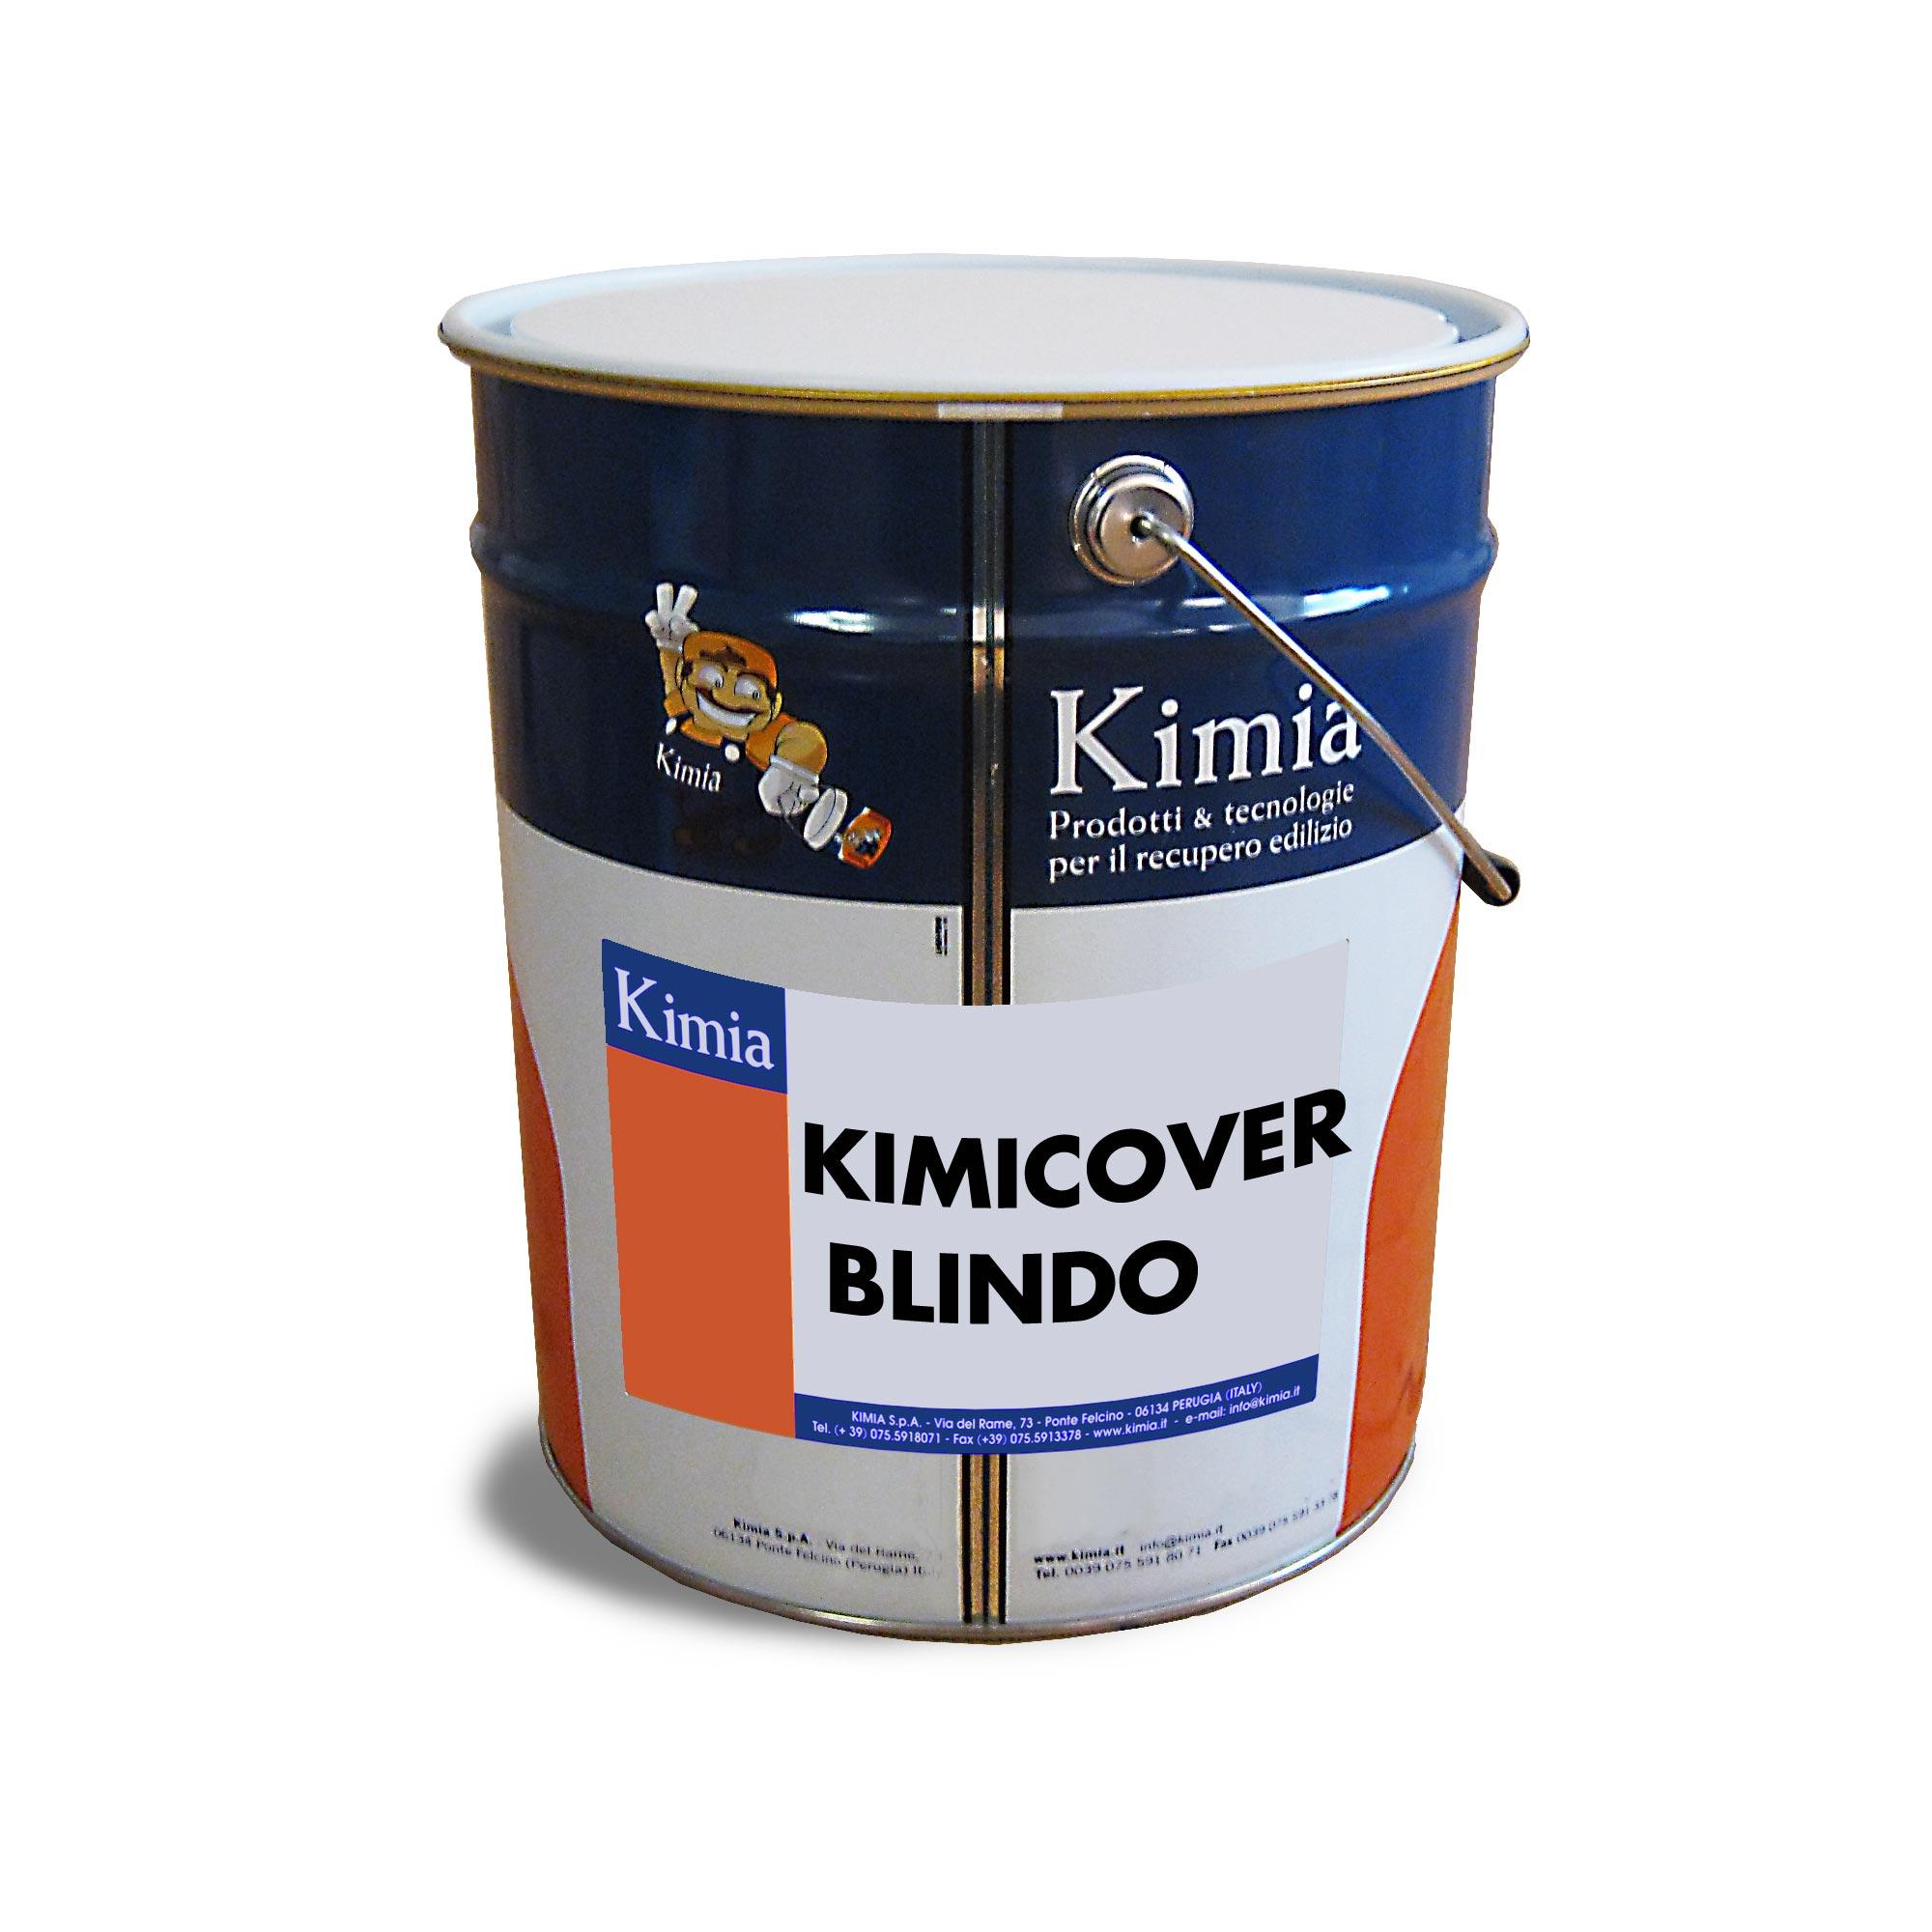 Kimicover BLINDO